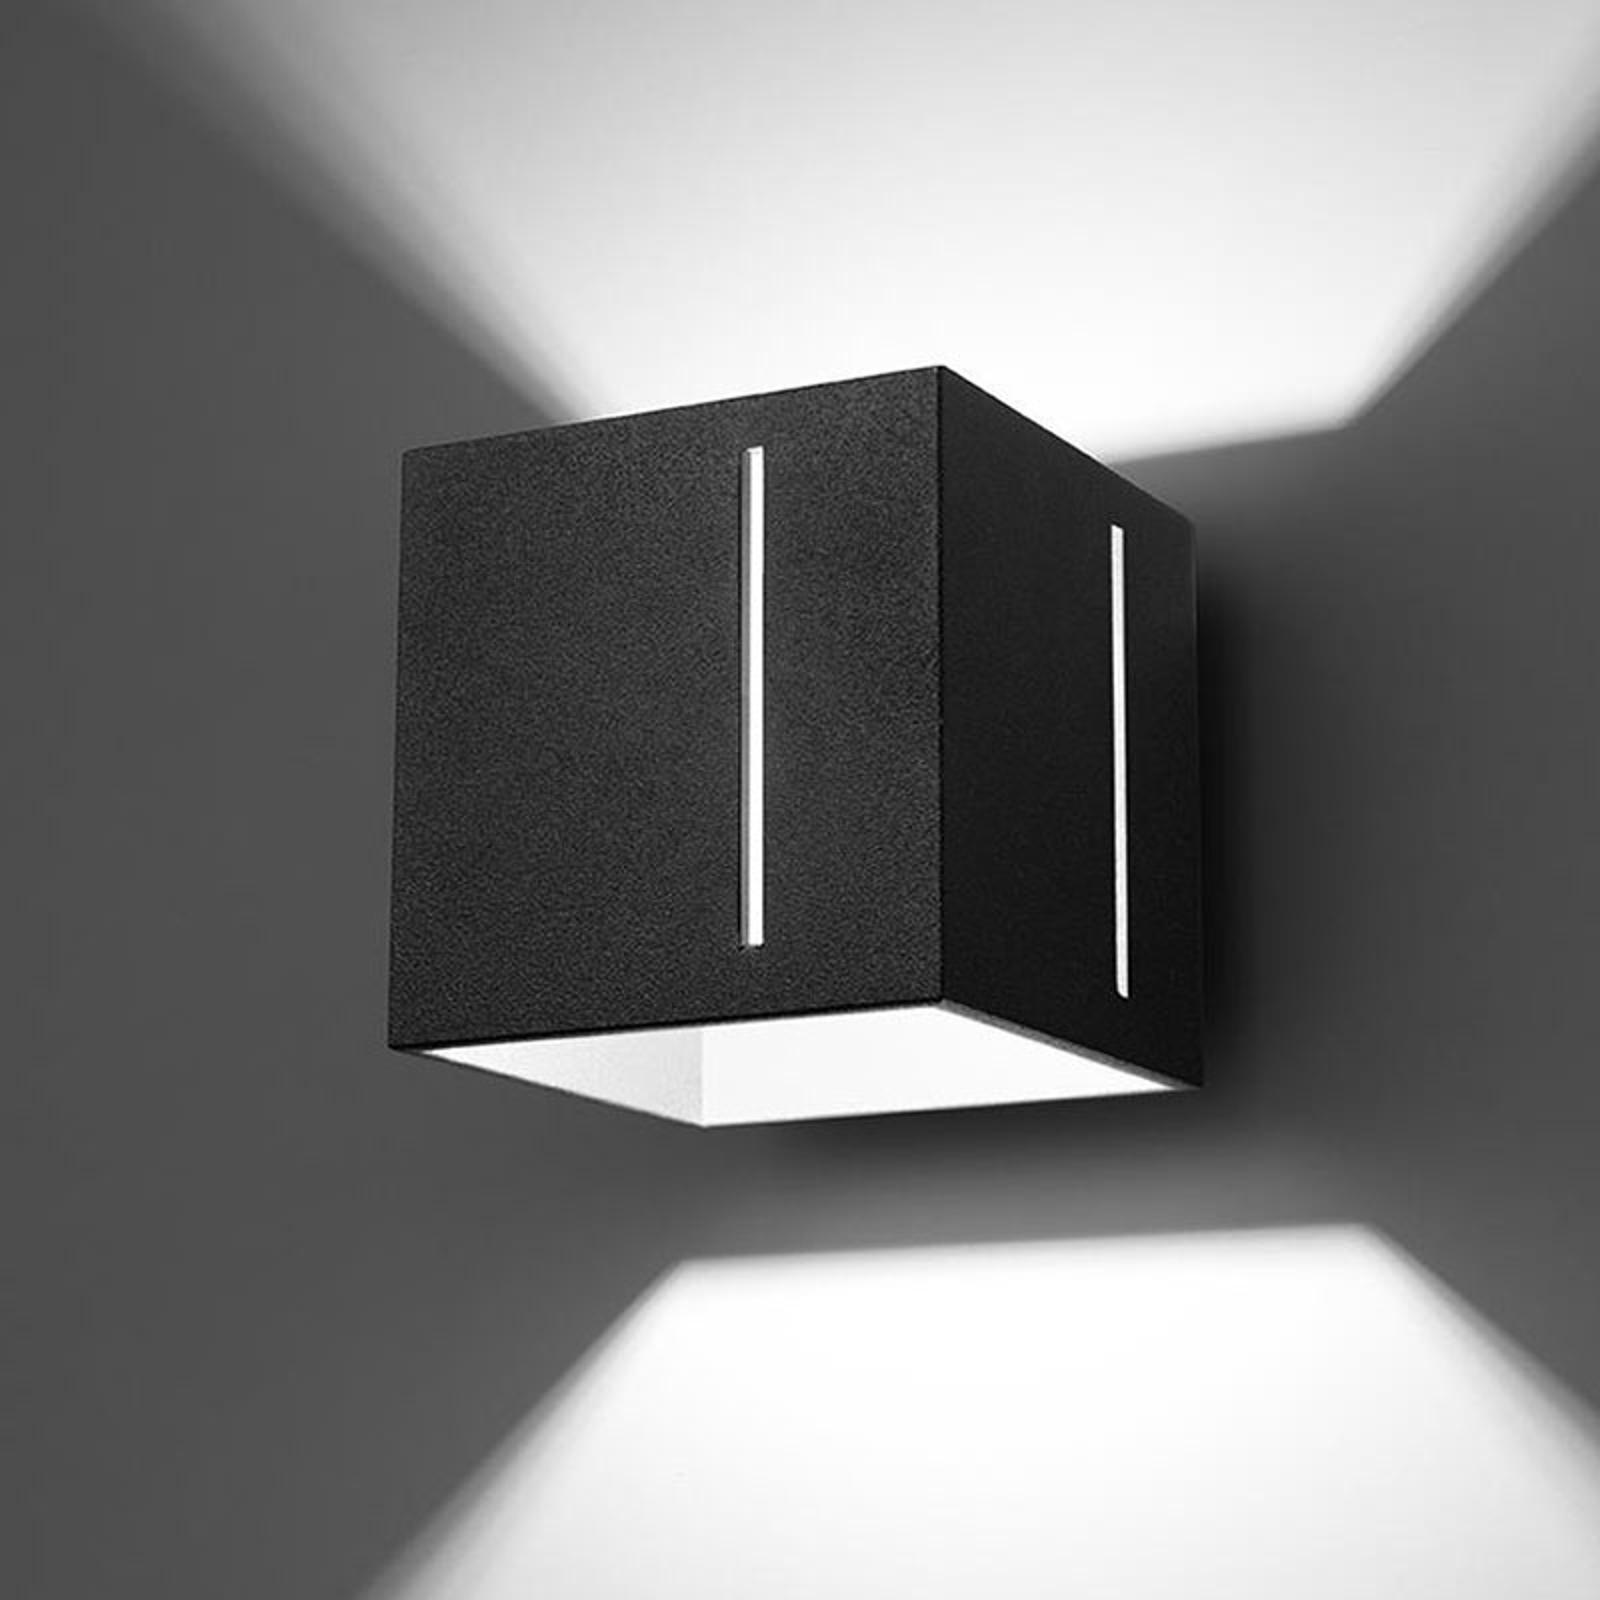 Wandleuchte Topic up/down aus Aluminium, schwarz